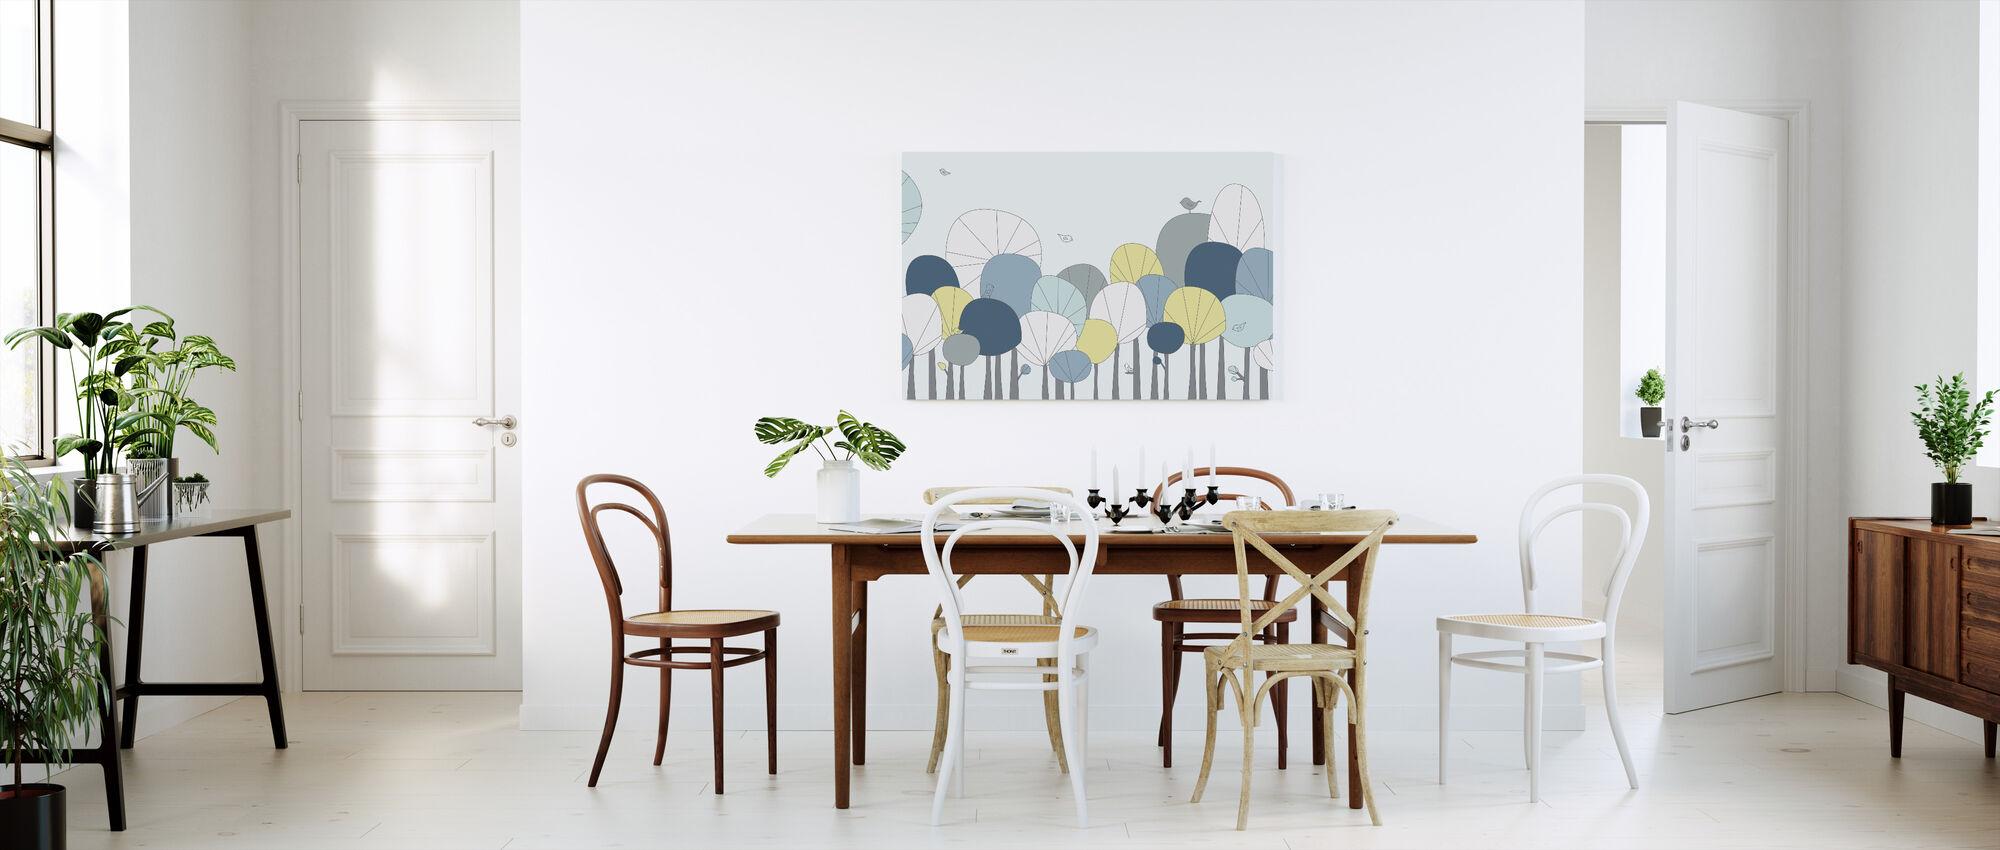 Happy Forest - Pastel Blue - Canvas print - Kitchen